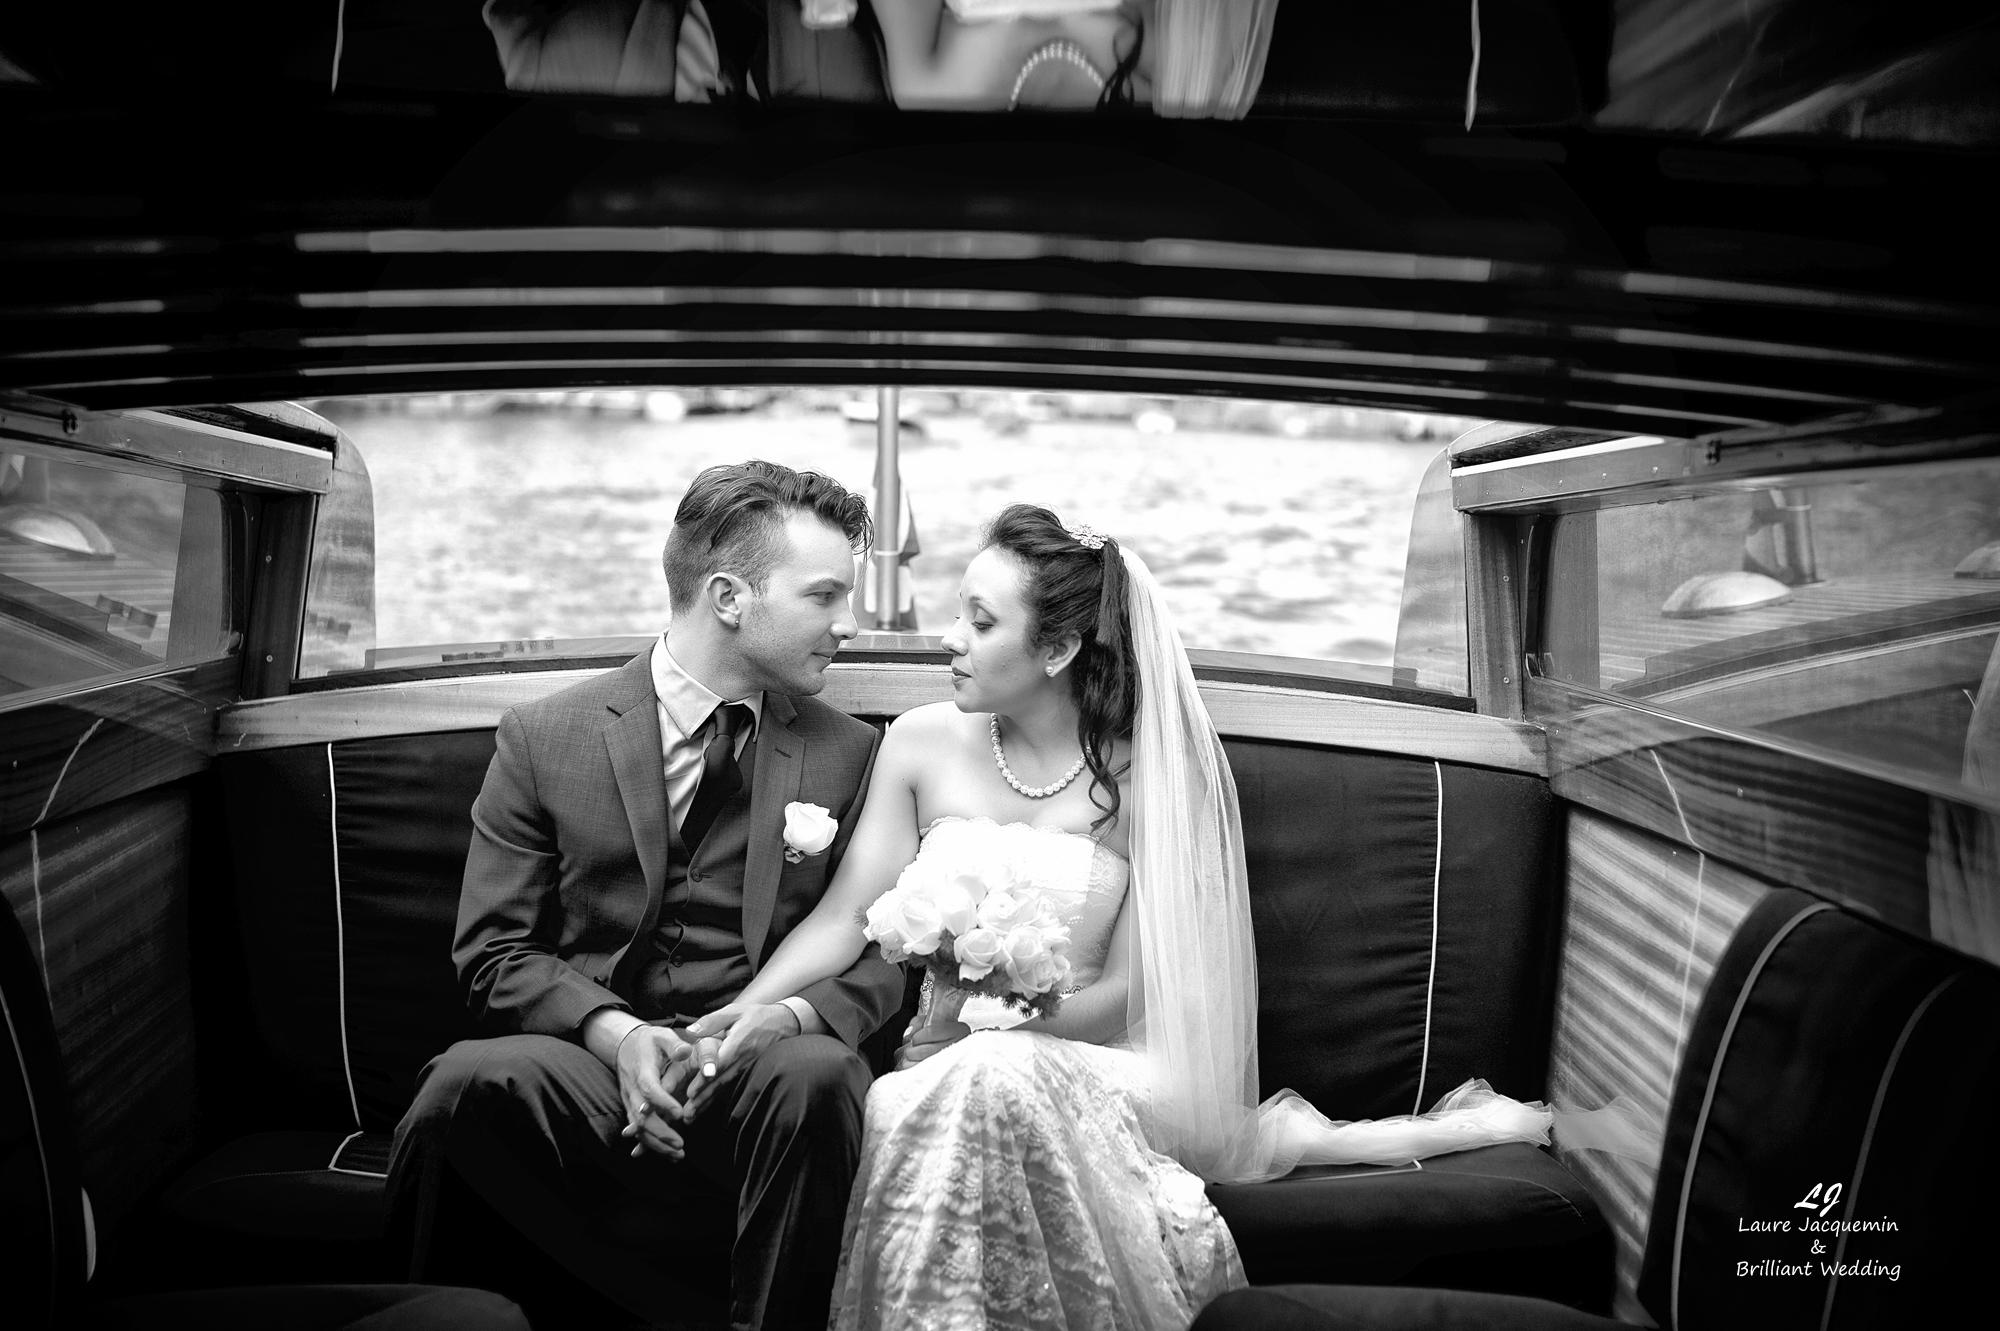 Venice Simbolic Wedding gondola venice Italy laure jacquemin photography (58) copia